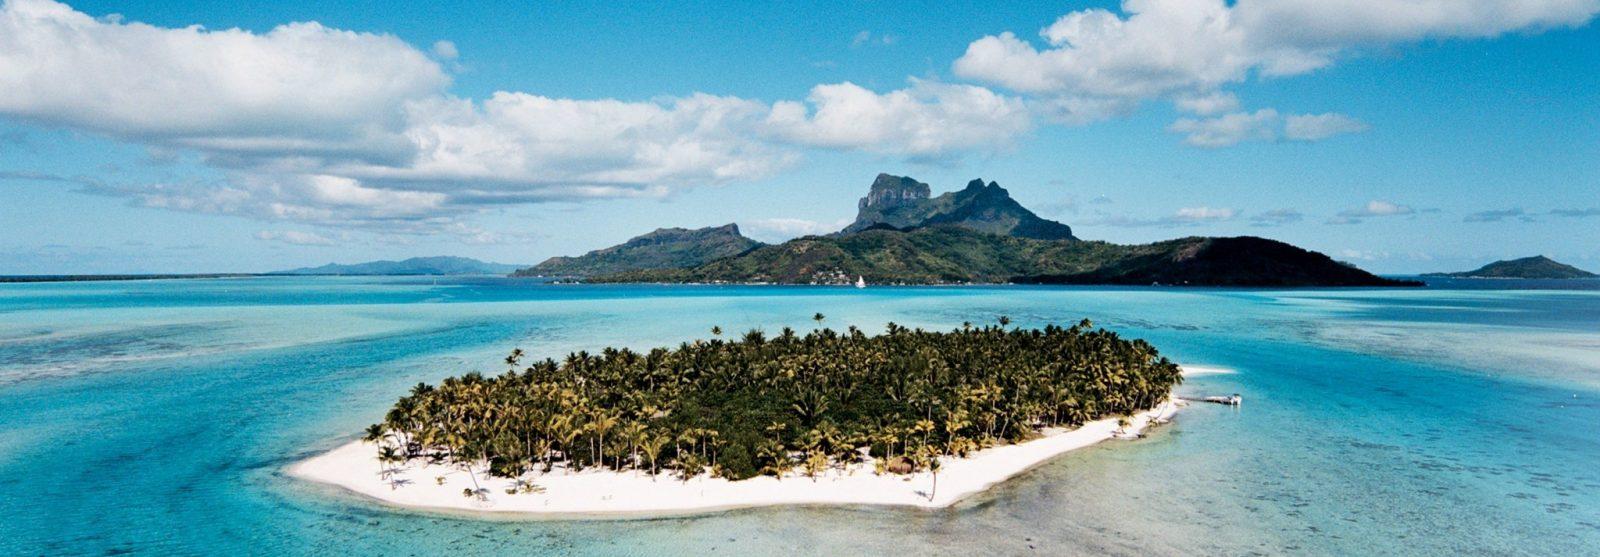 Francois Nars Island